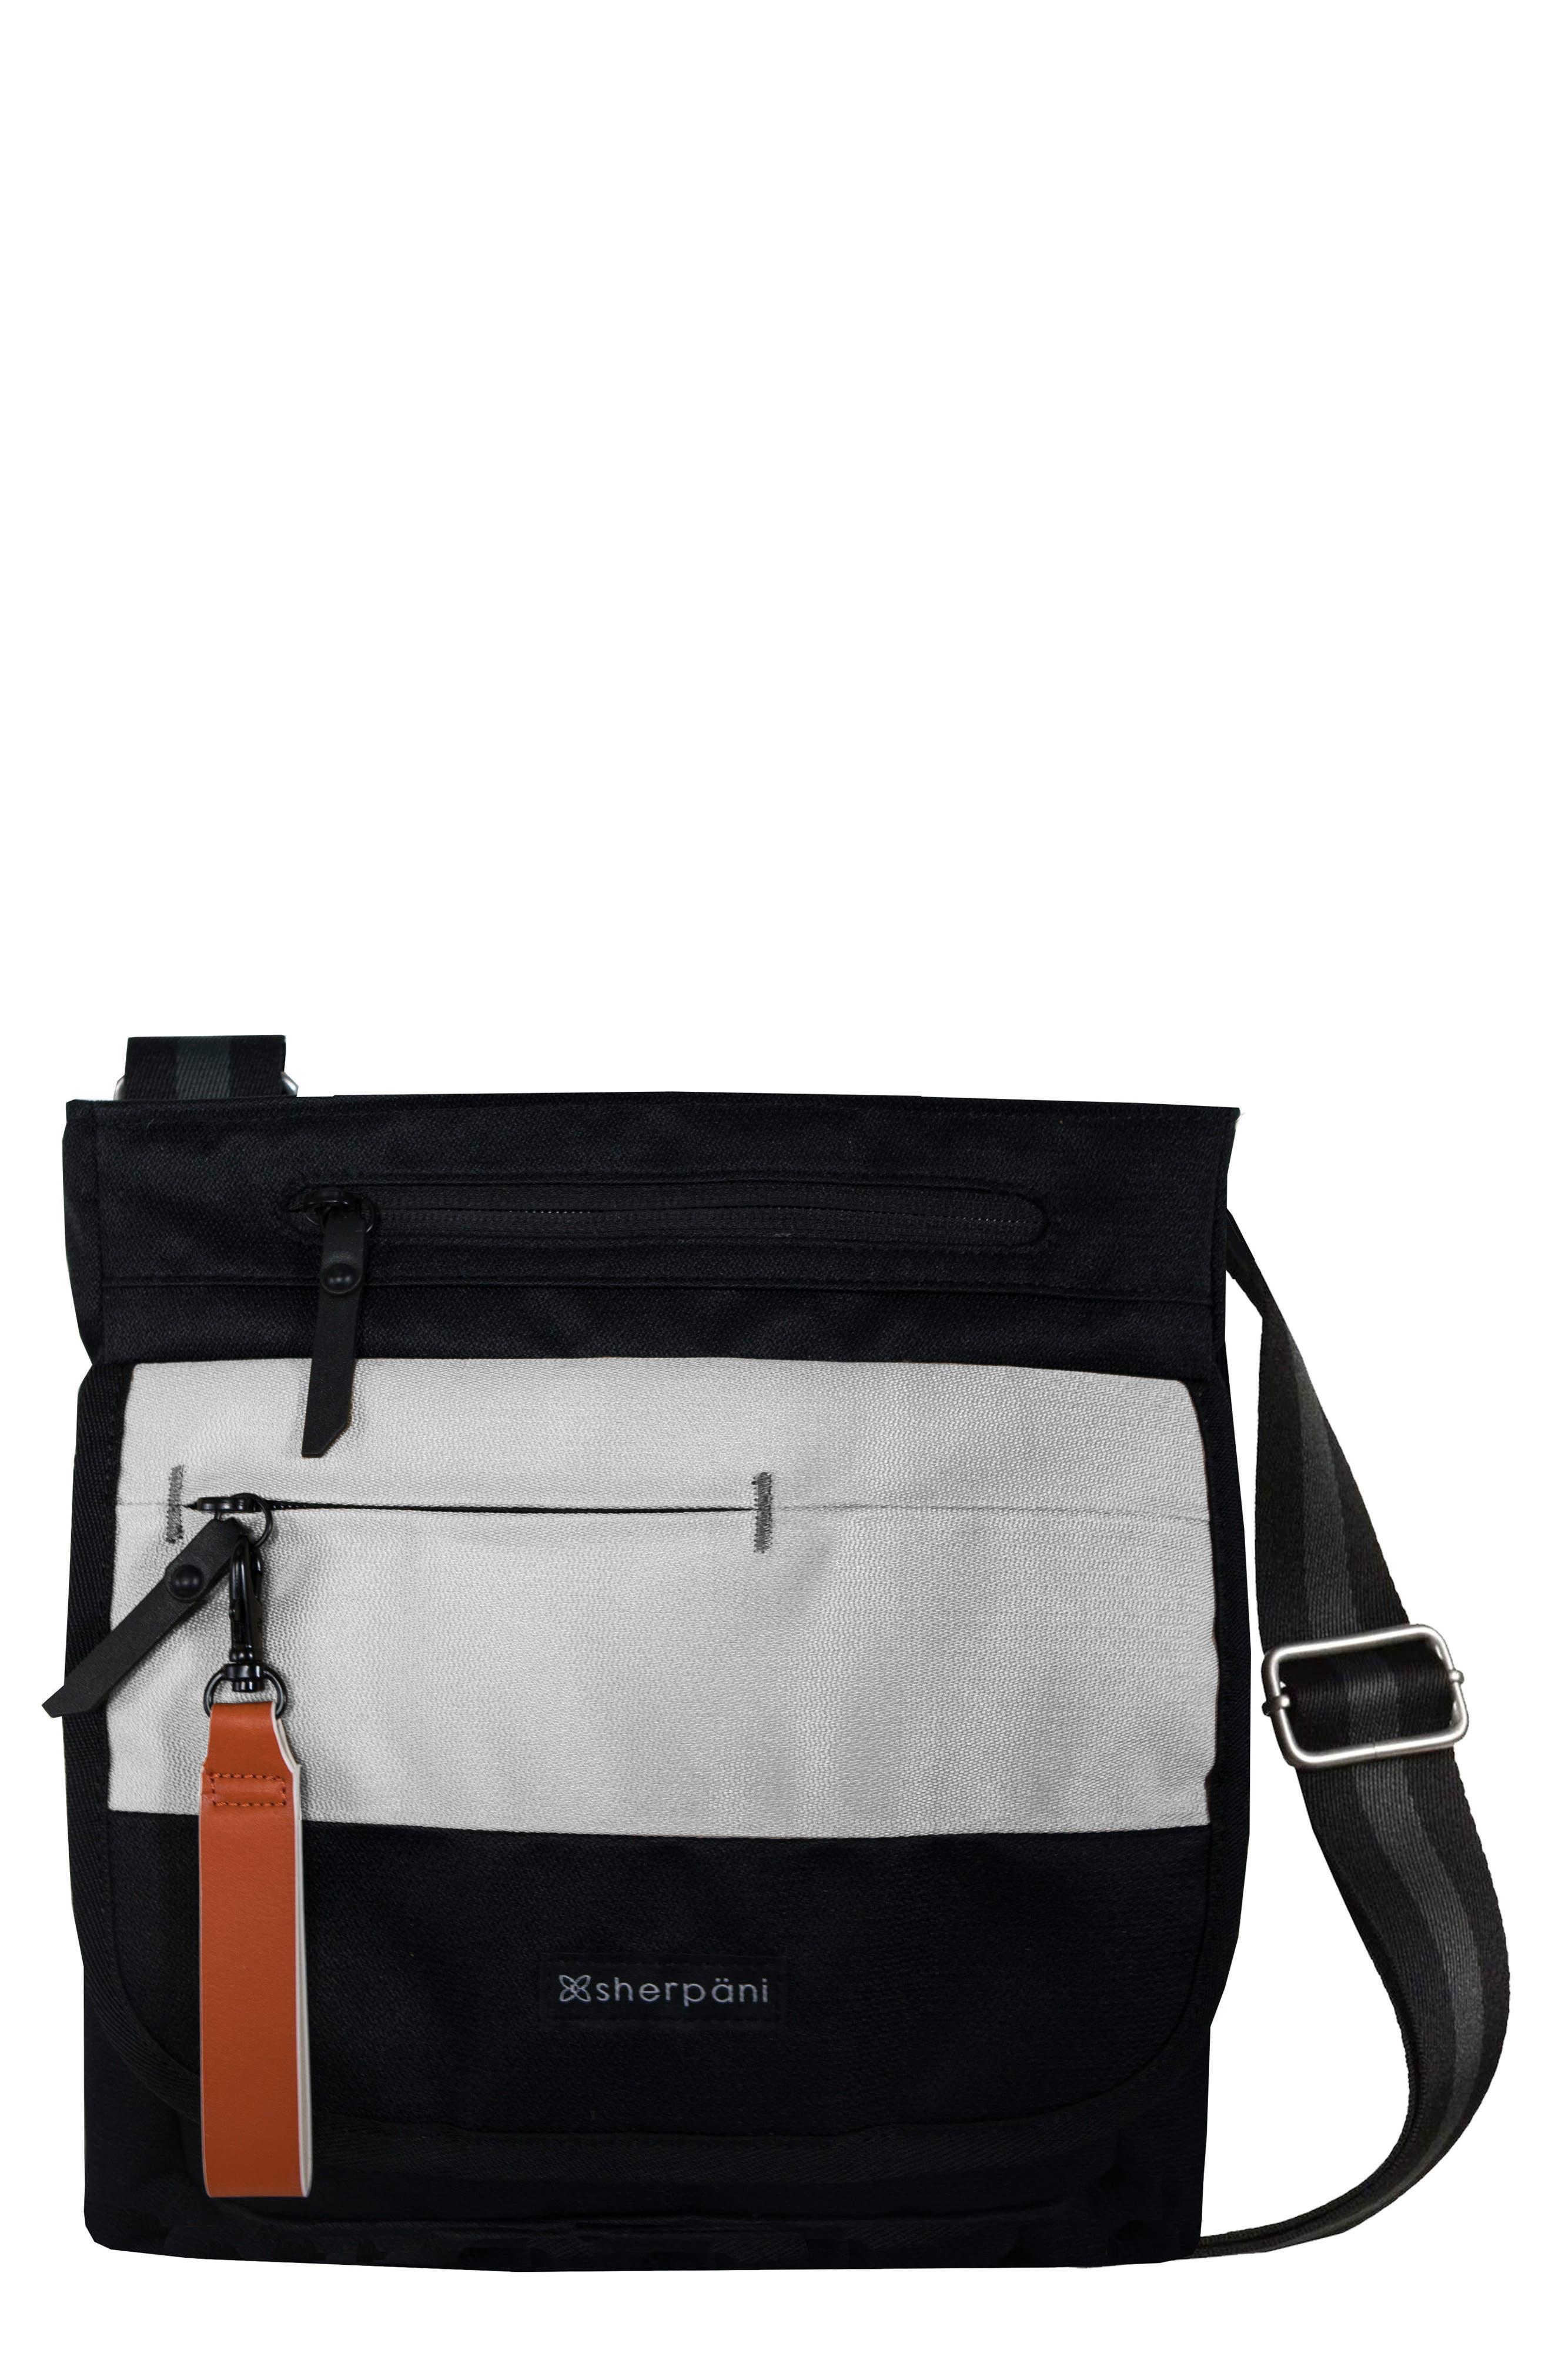 Jag FRFID Crossbody Bag,                         Main,                         color, Birch